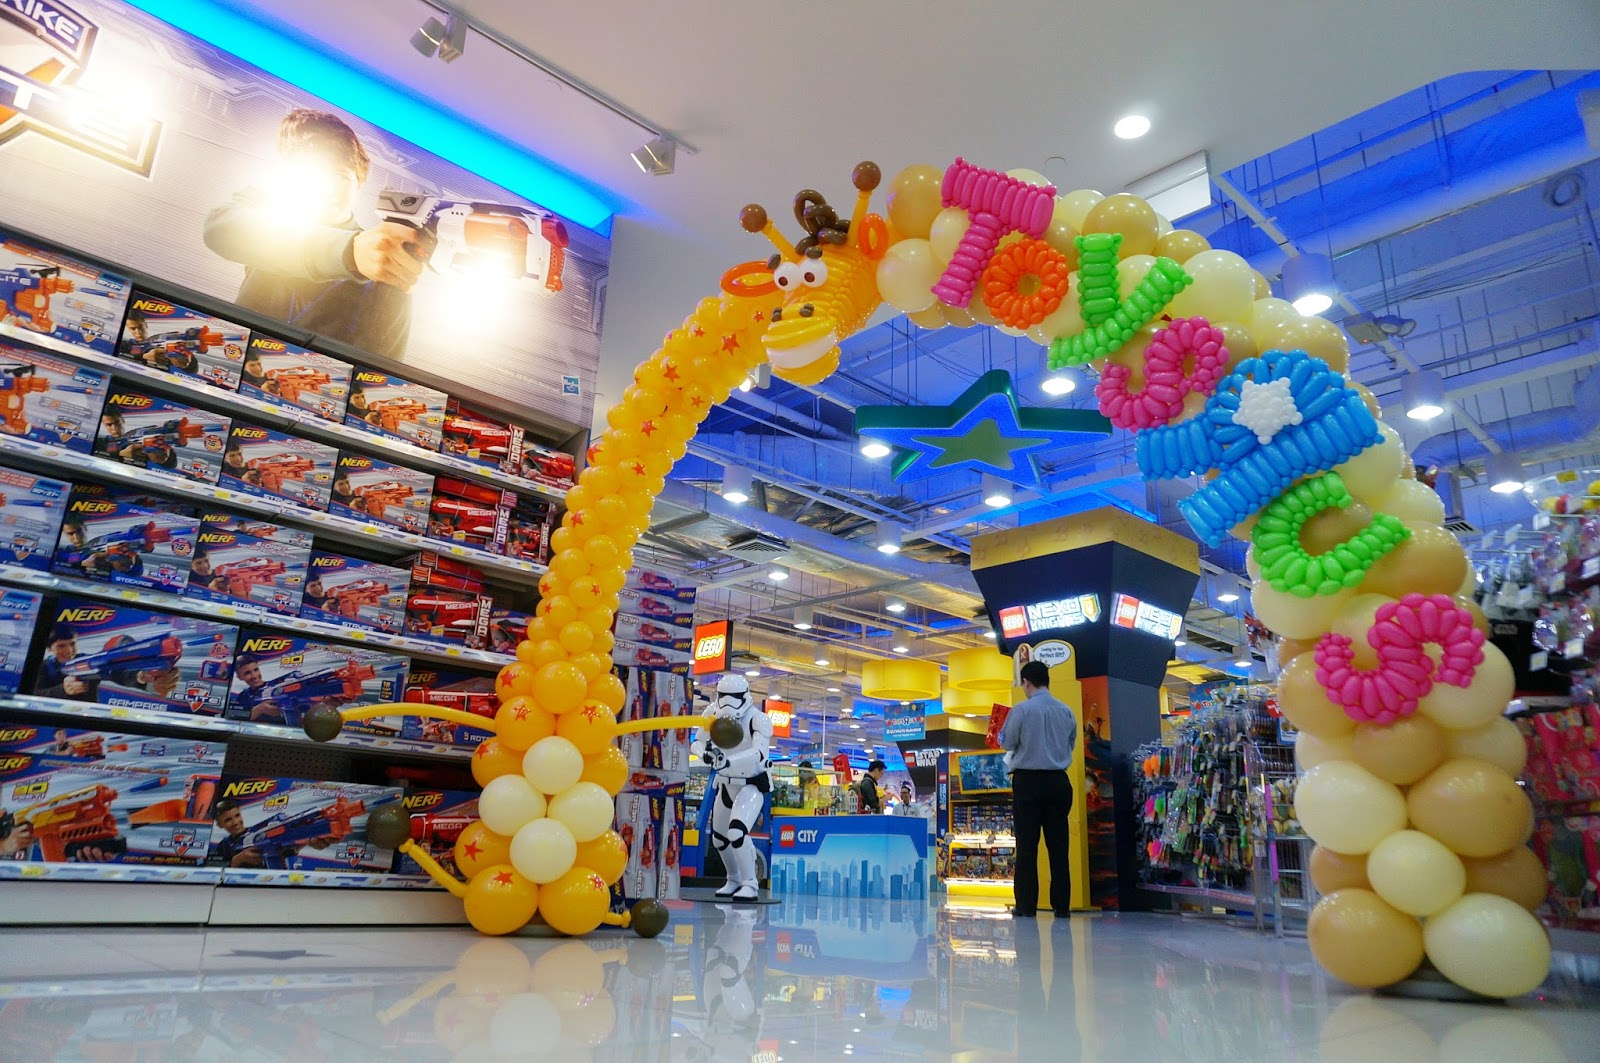 ninja turtle chair toys r us eames reproduction vivocity flagship store revamp